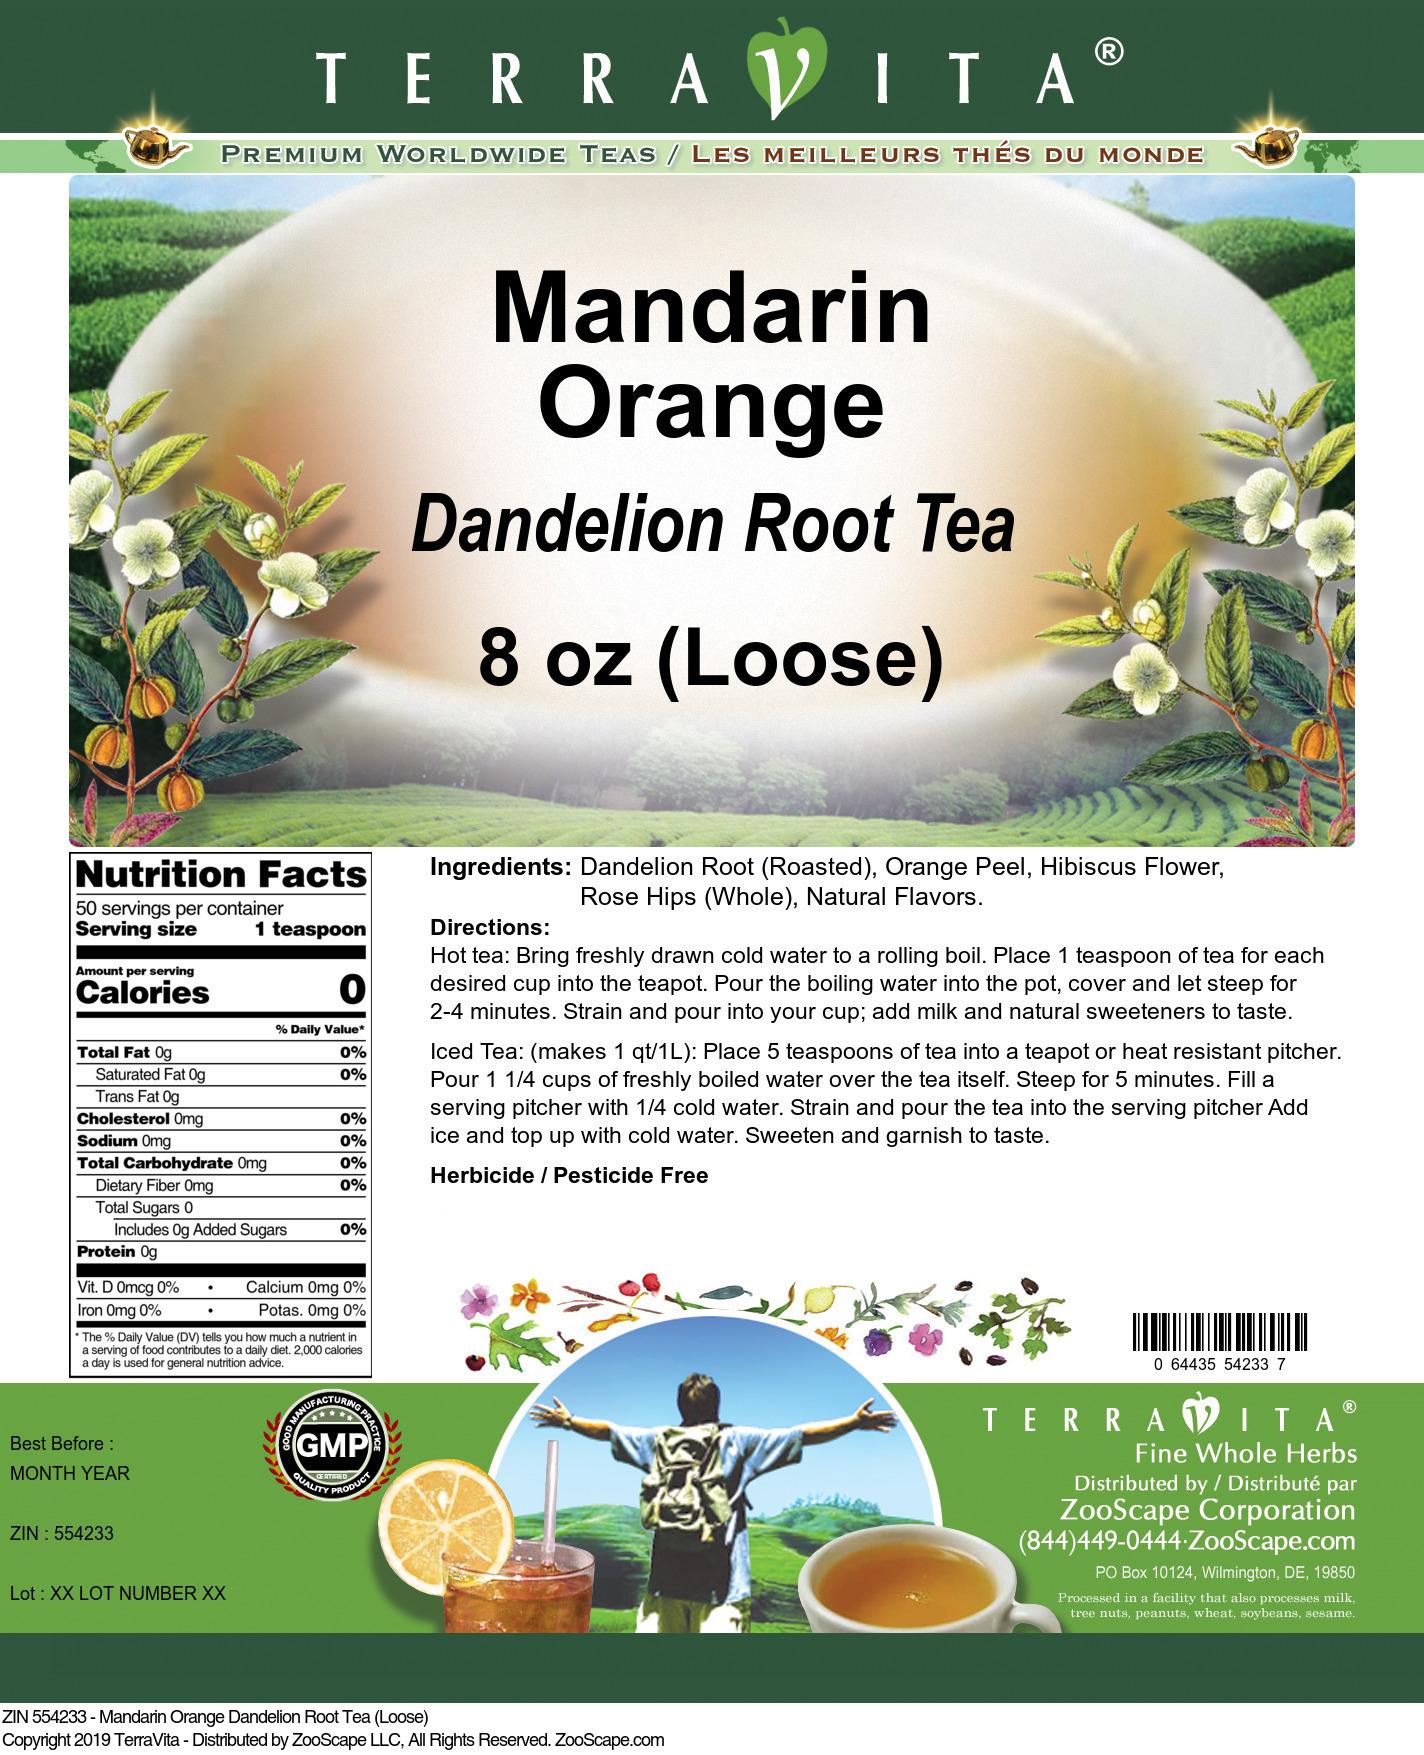 Mandarin Orange Dandelion Root Tea (Loose)